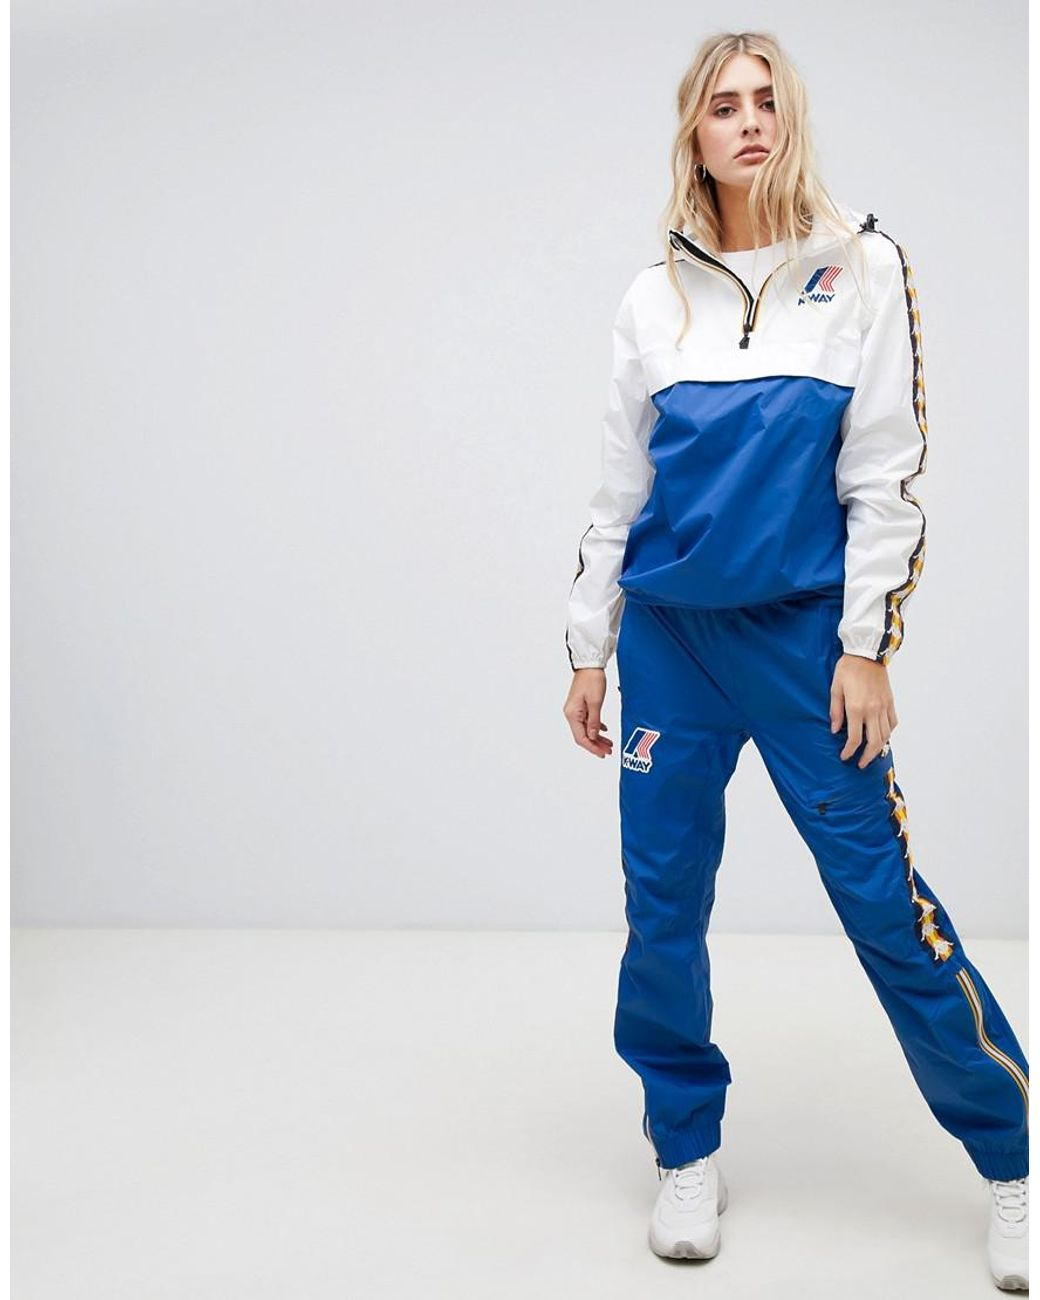 reasonably priced online here look good shoes sale K-way X Kappa Waterproof Trouser With Strap Detail